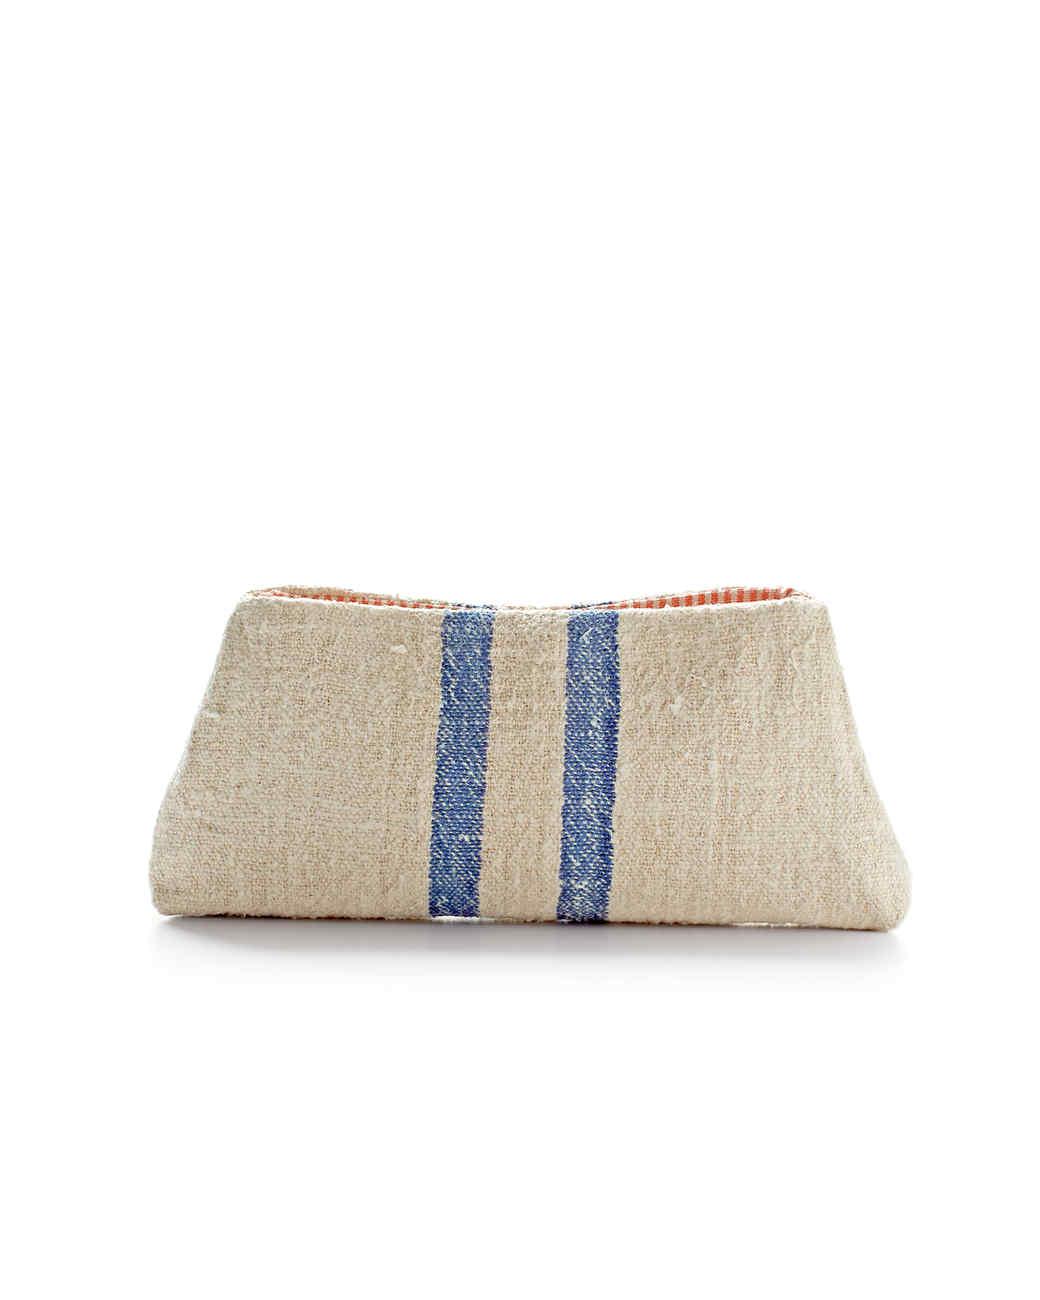 grain-sack-clutch-mld108095.jpg